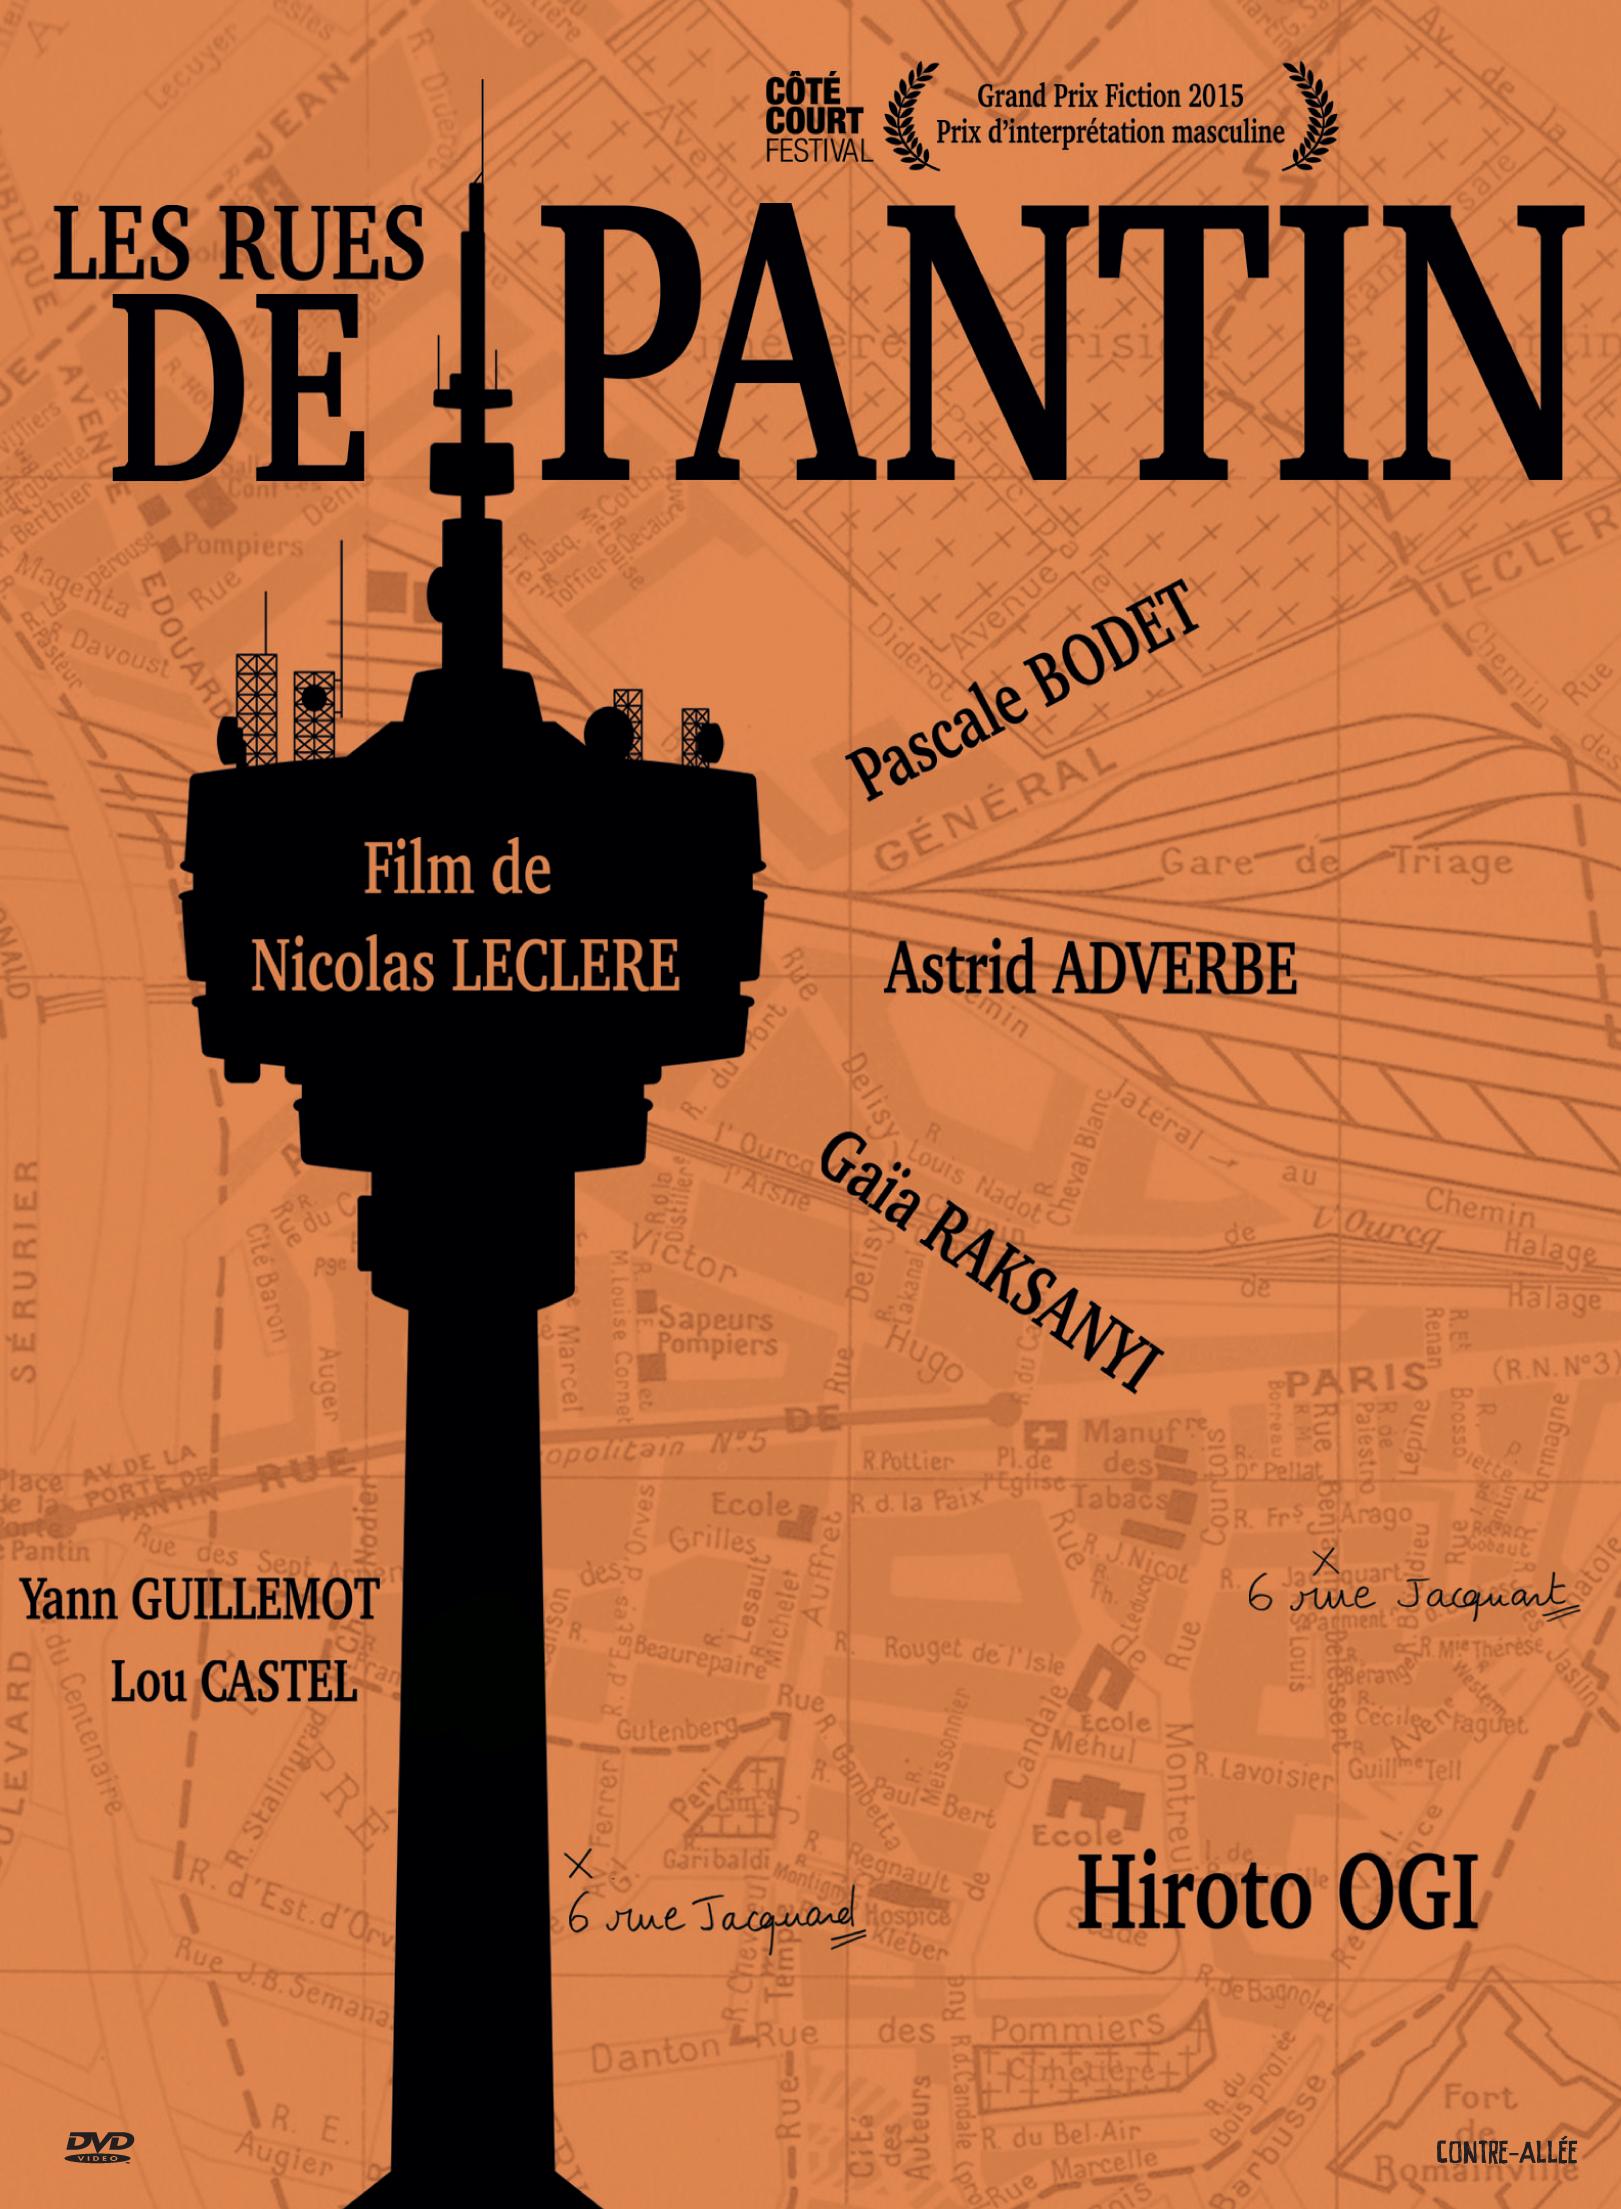 Pantin-NewDIGI.indd